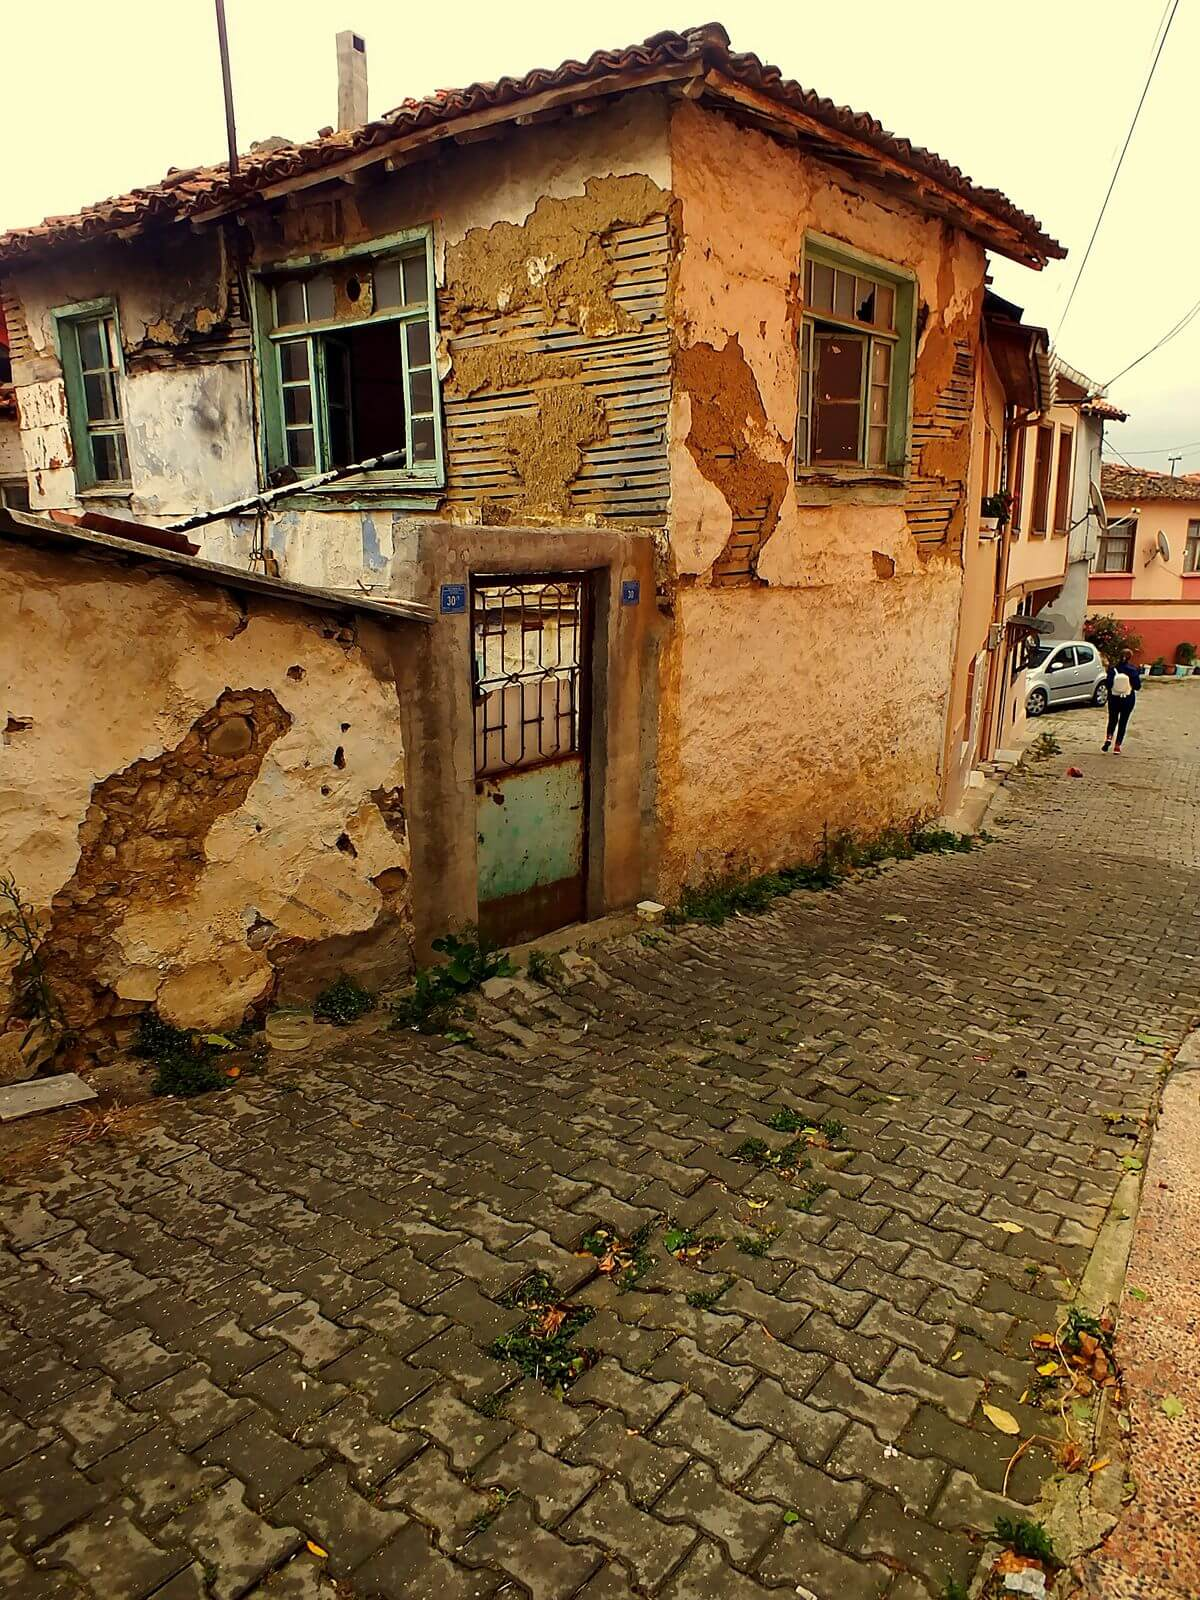 Tirilye Gezisi Marangozhane Sokak